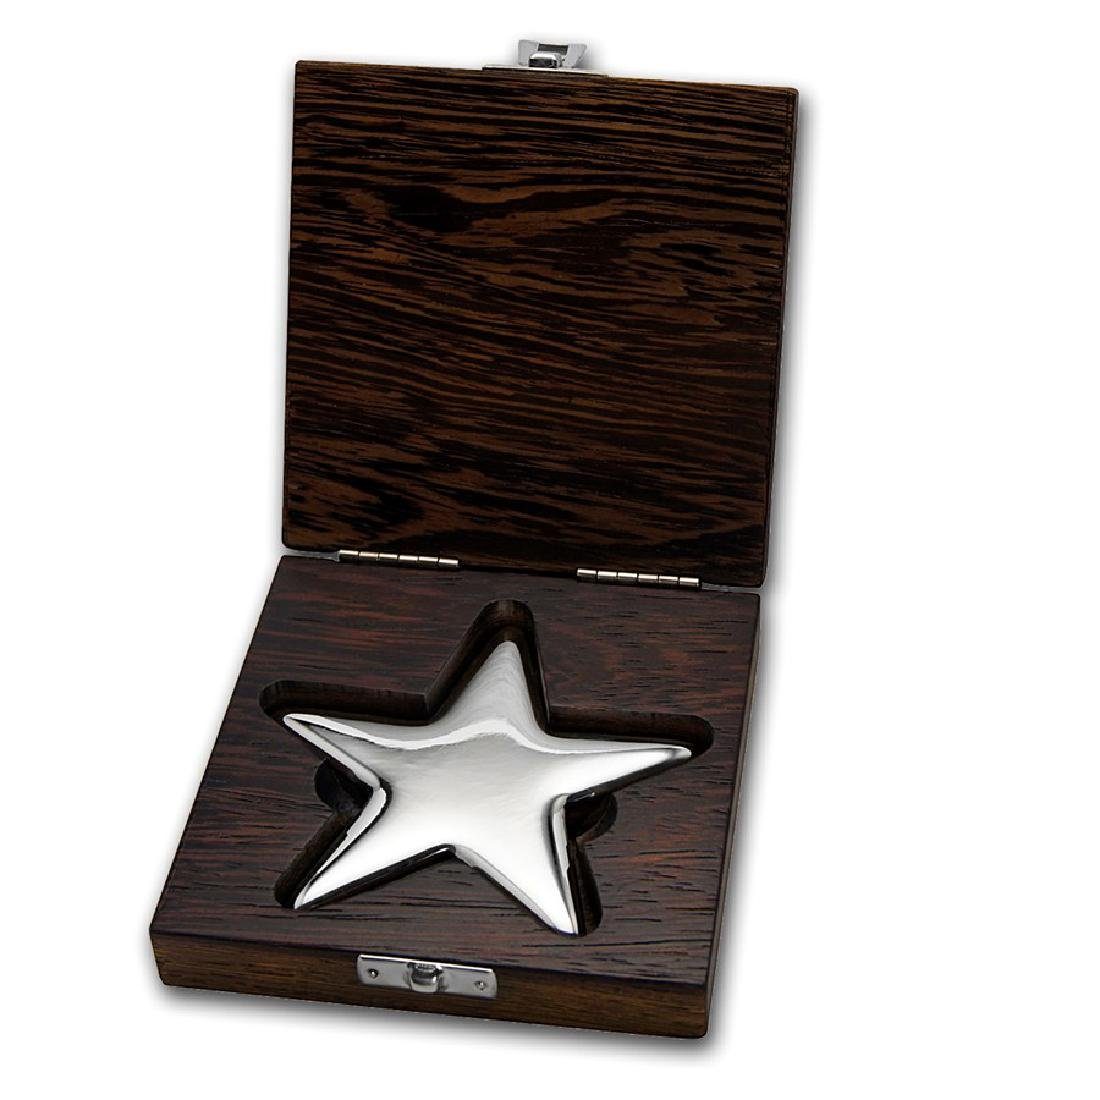 Genuine 500 gram Fine Silver Star Bar - Geiger